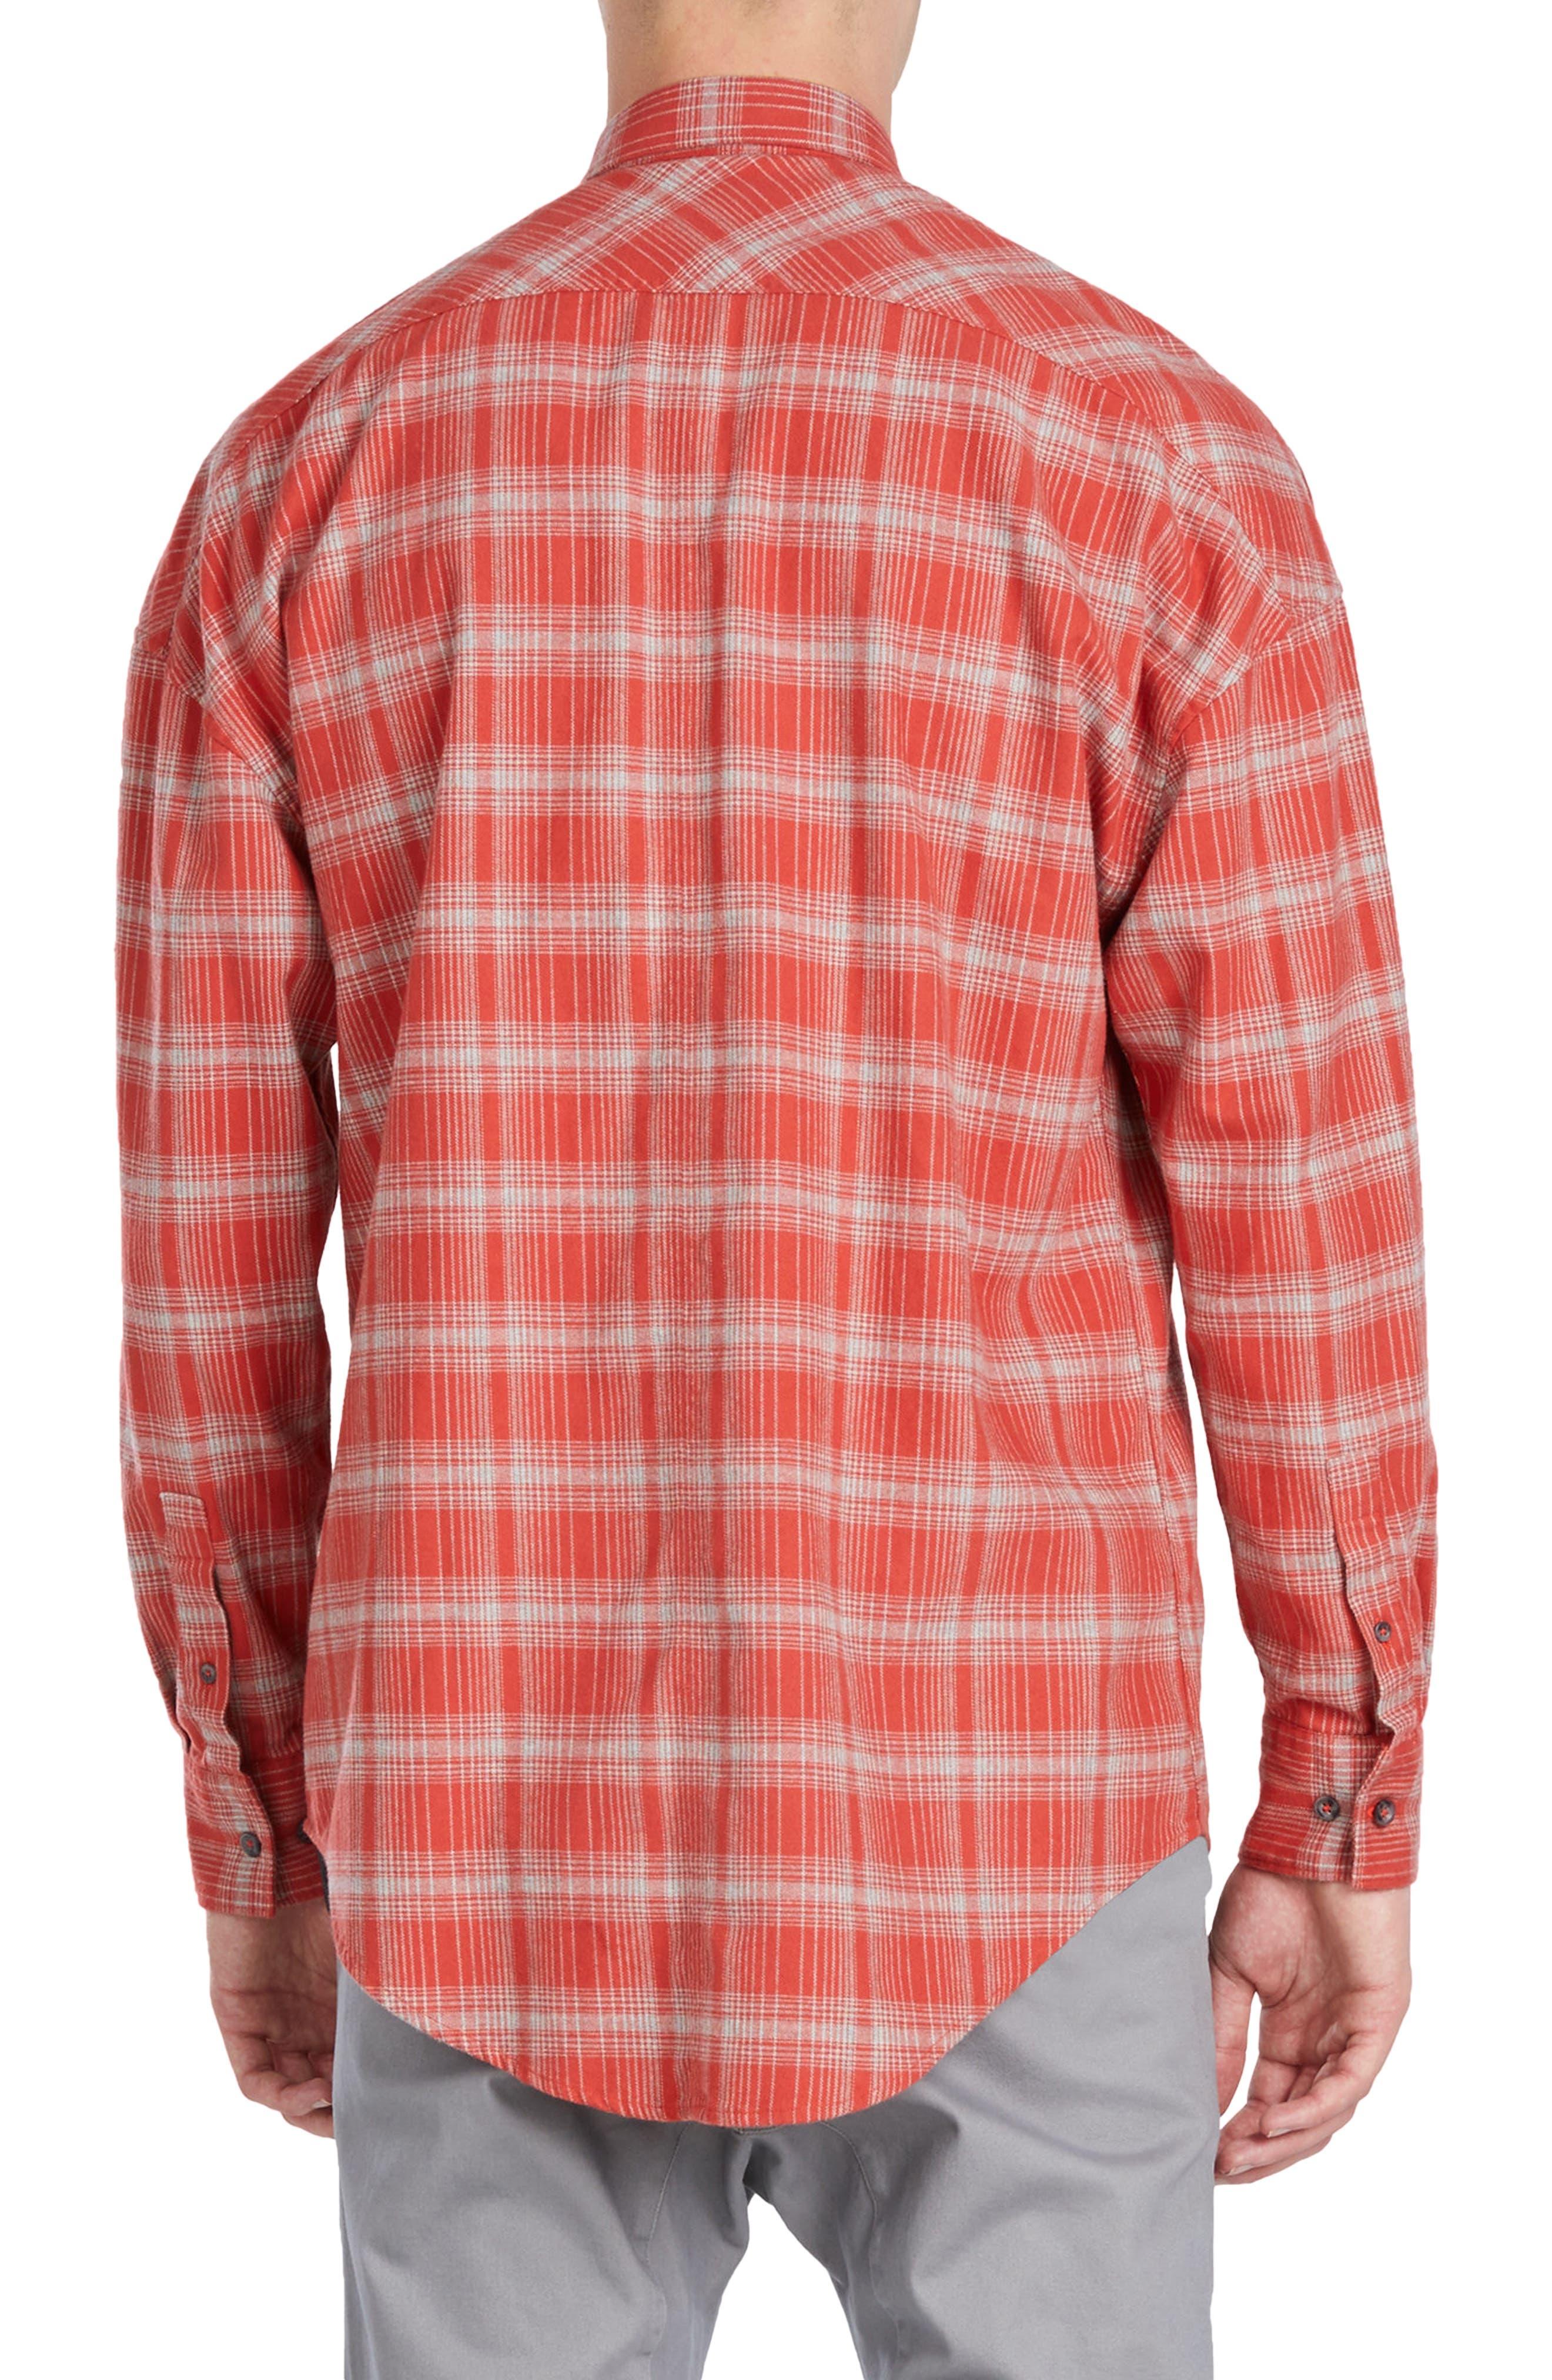 Rugger Plaid Sport Shirt,                             Alternate thumbnail 2, color,                             641